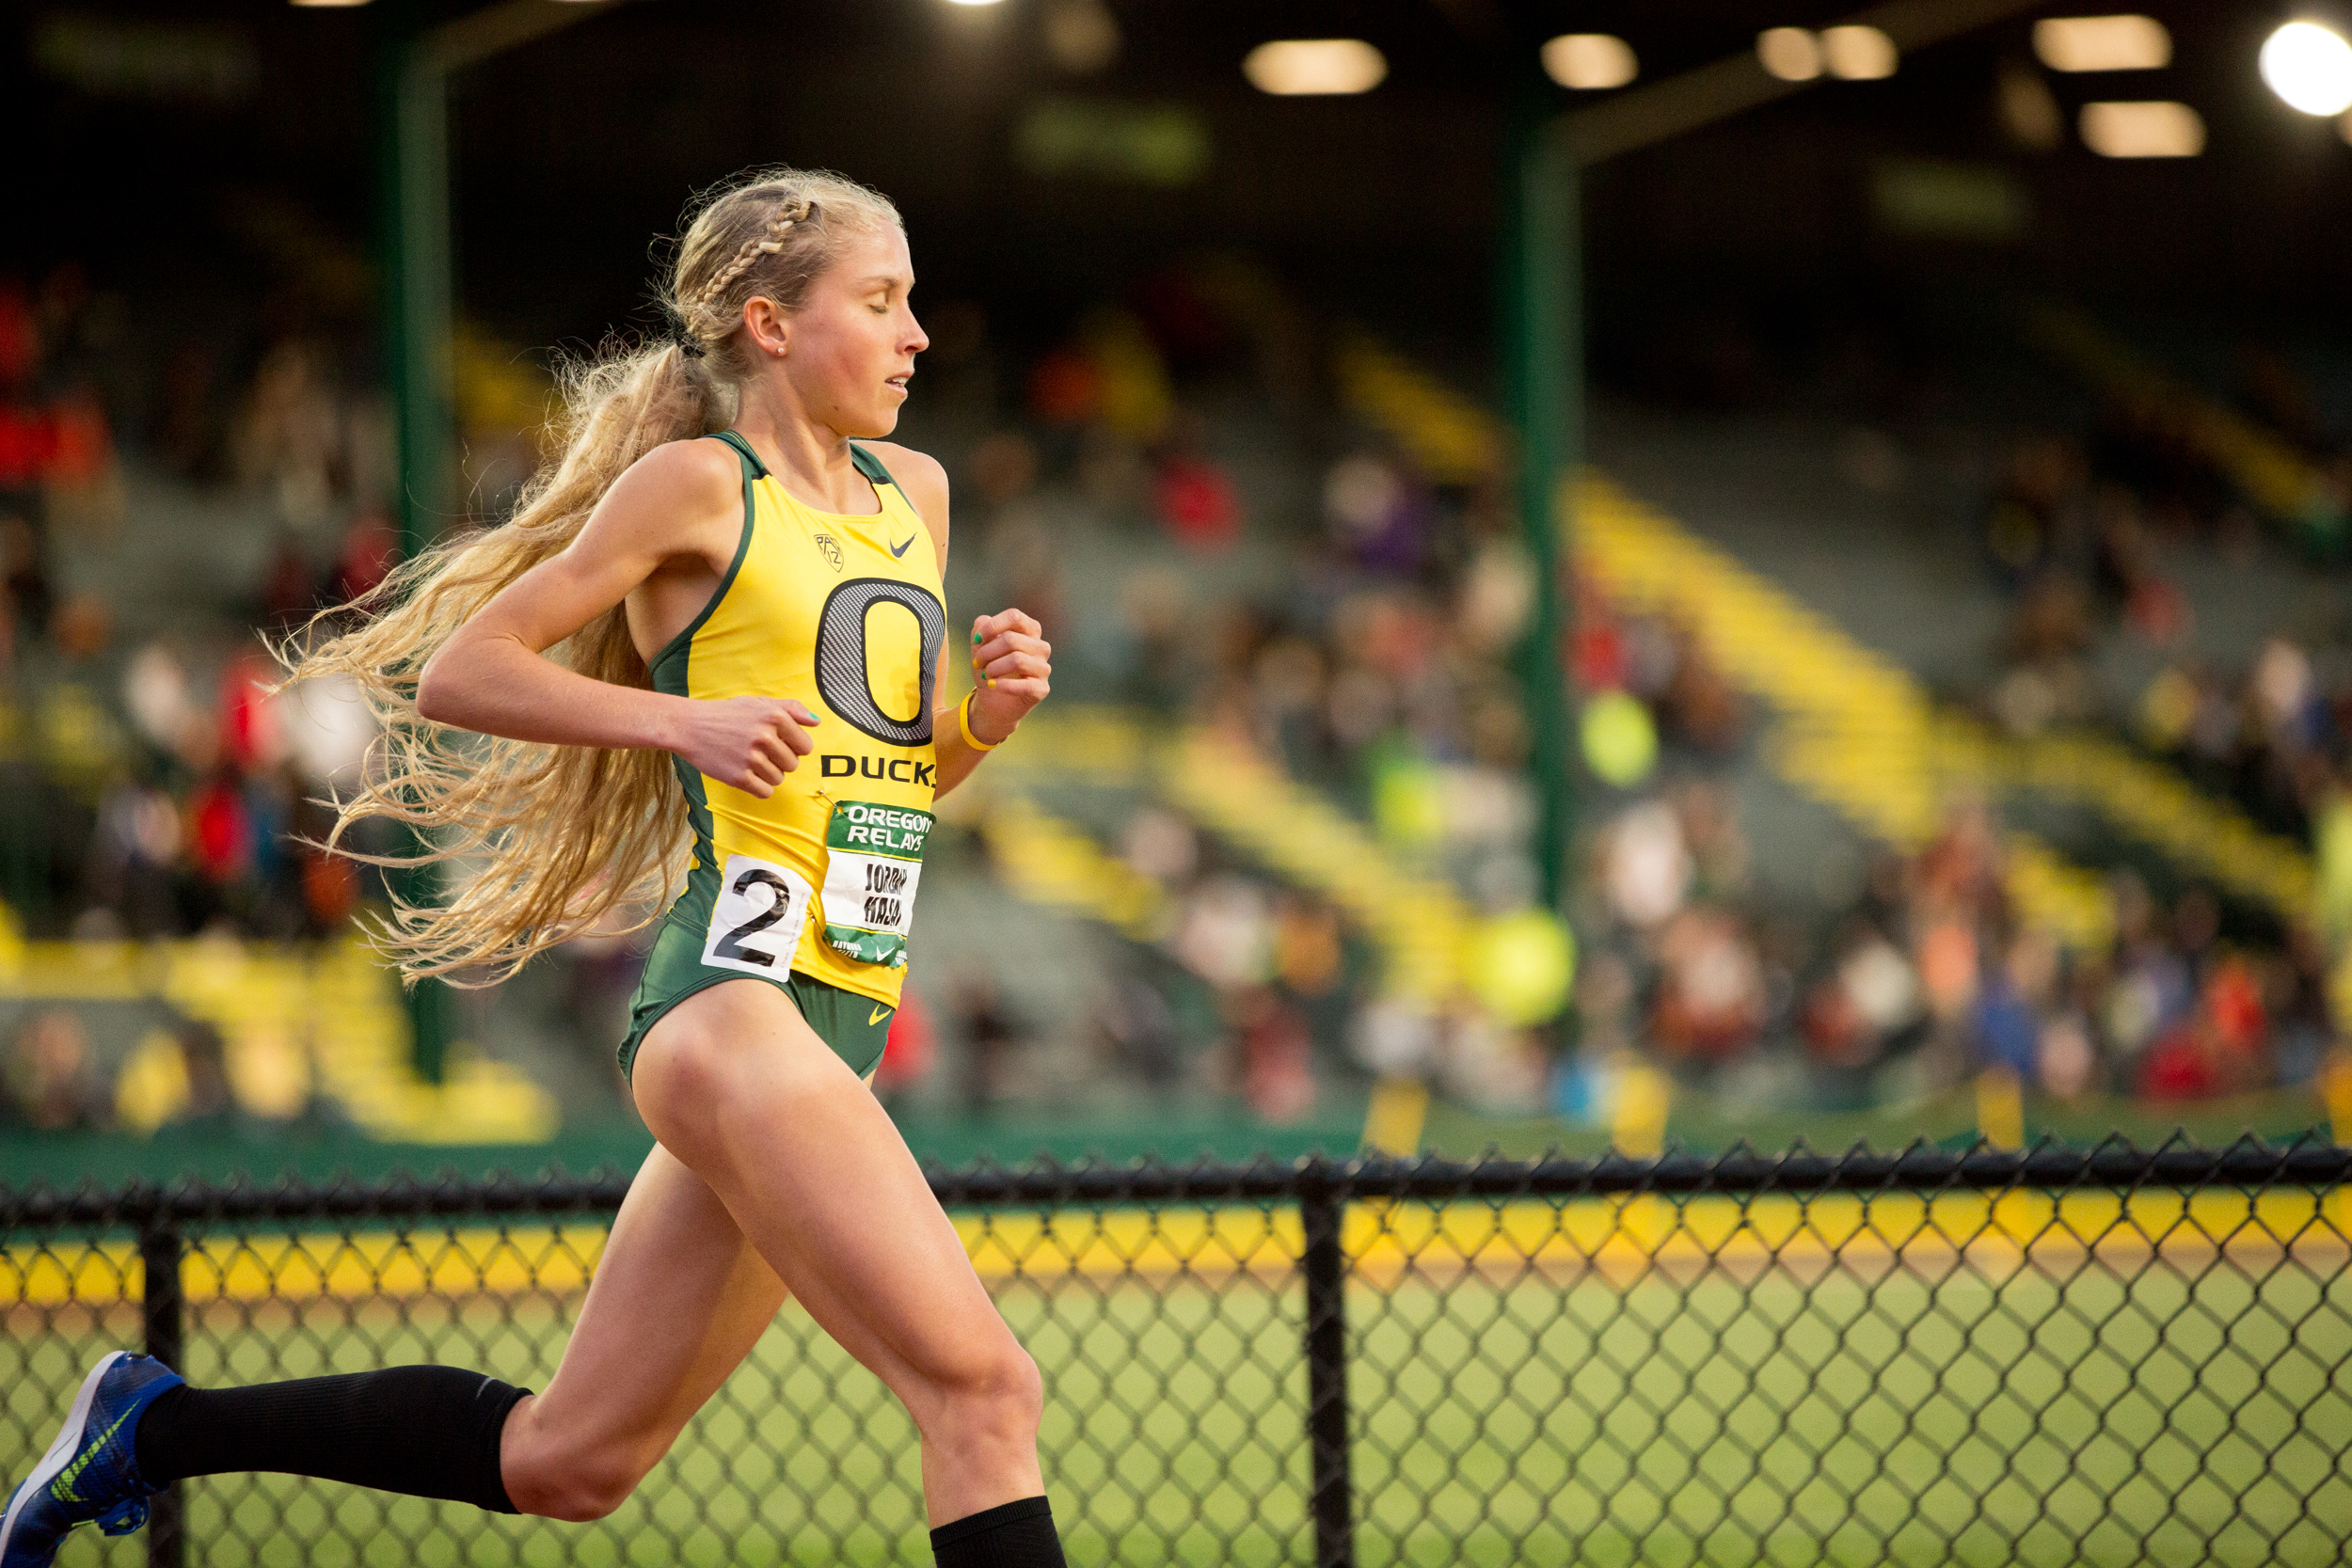 Eugene_Oregon_Hayward_Field_Track